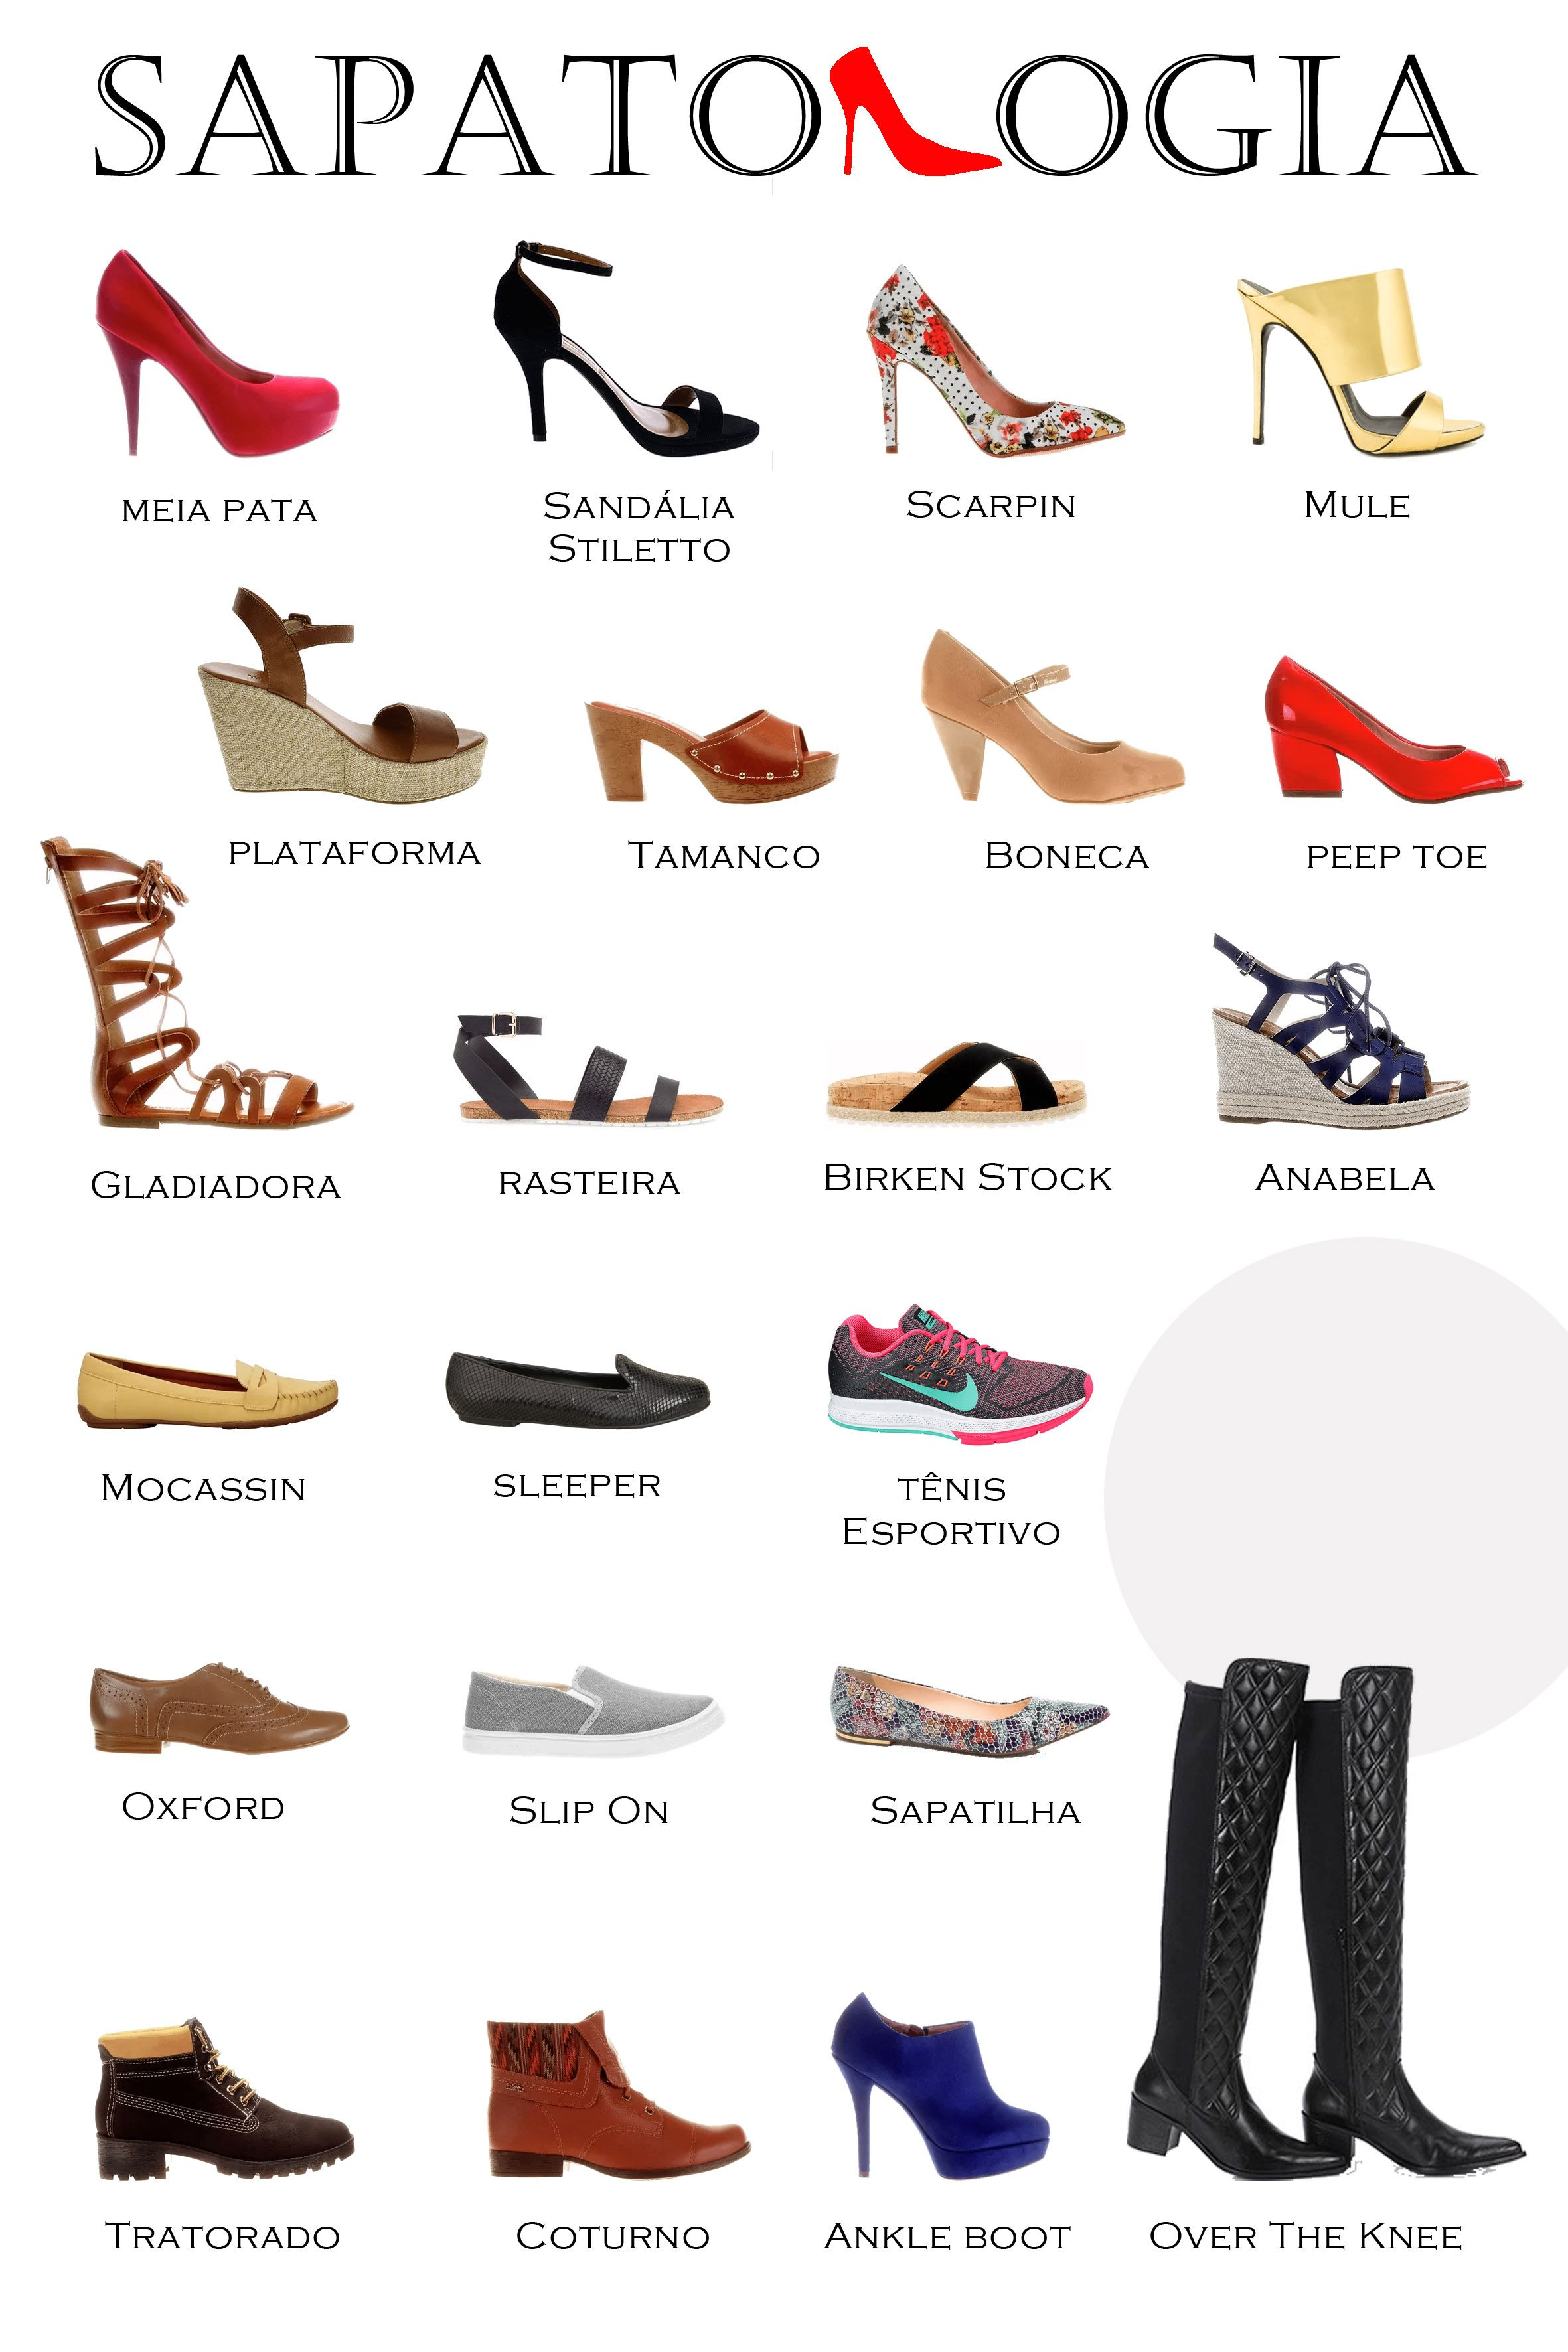 52e03dca01fd73 Sapatologia | Shoe-aholic | Sapatos, Sapatos fashion e Tipos de sapatos